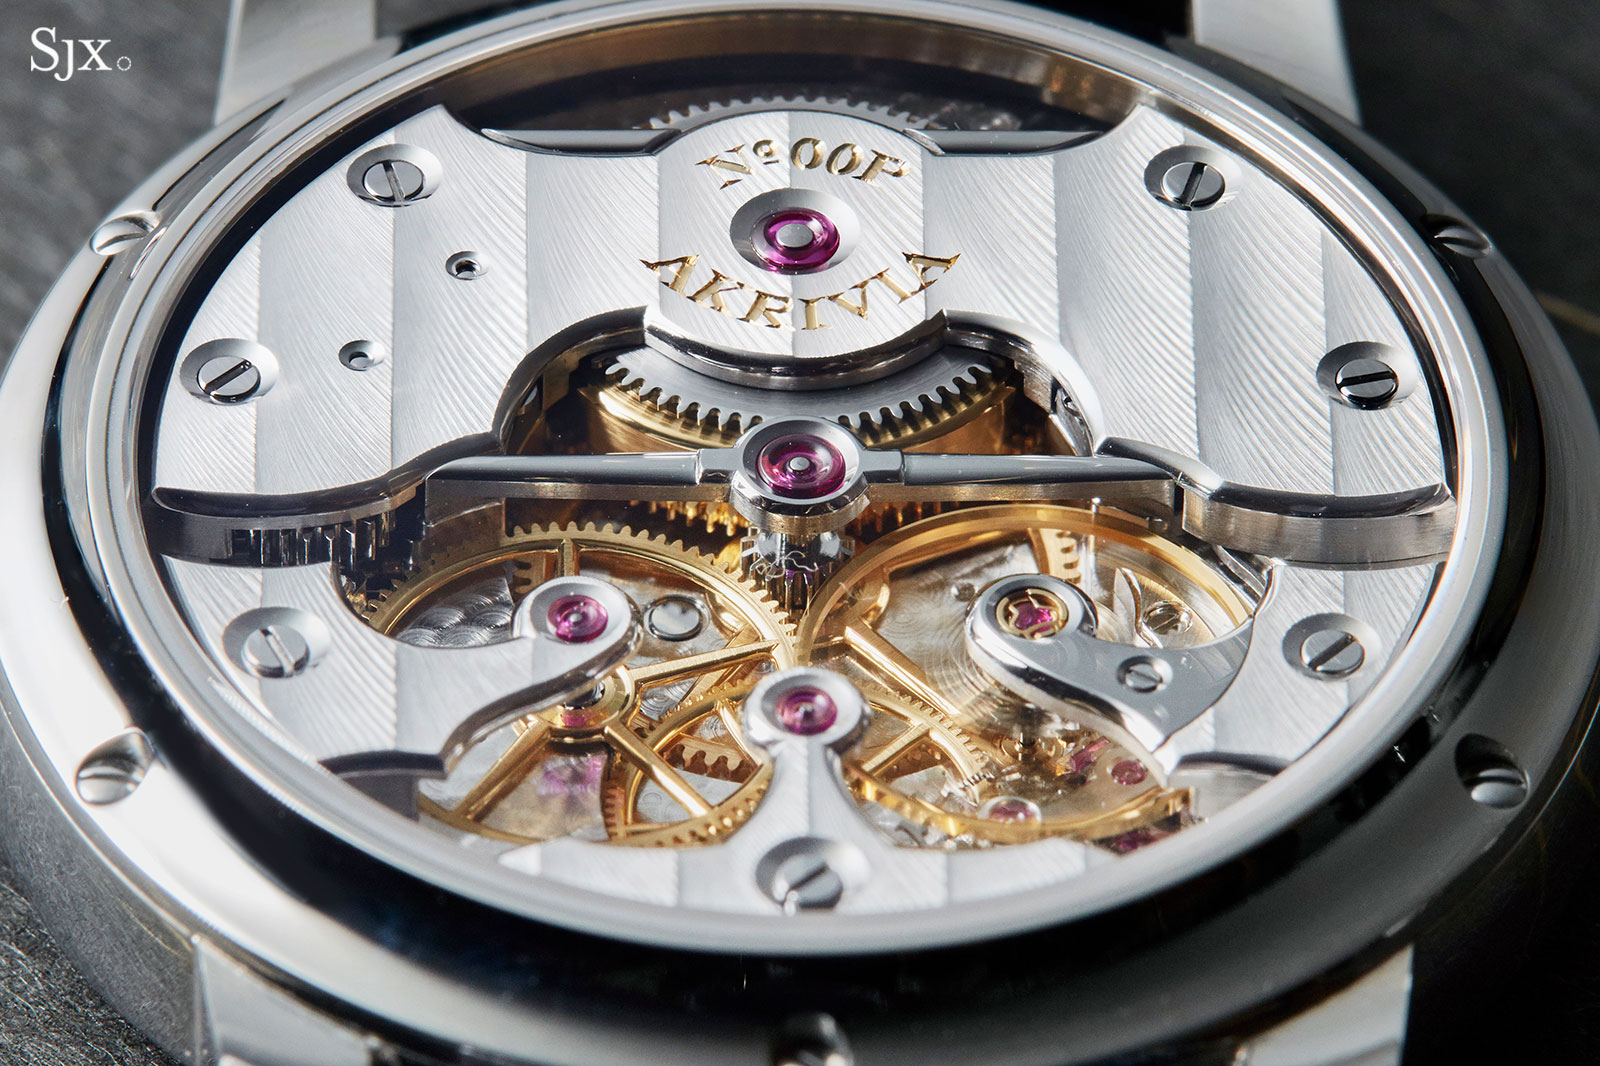 Akrivia Chronometre Contemporain Rexhep Rexhepi 13